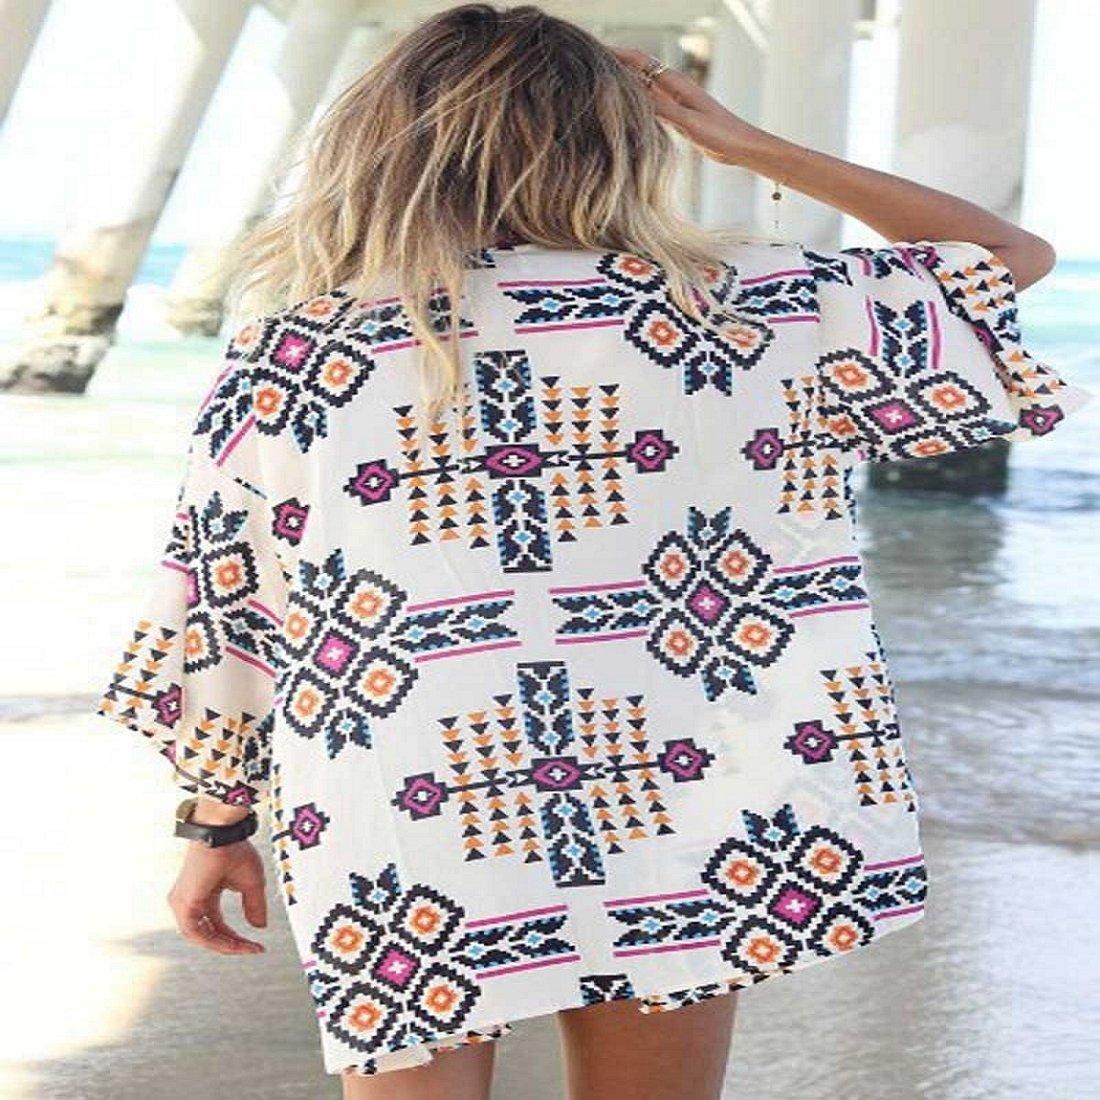 Sannysis Frauen-Geometrie Printed Chiffon-Schal Cover up Bluse